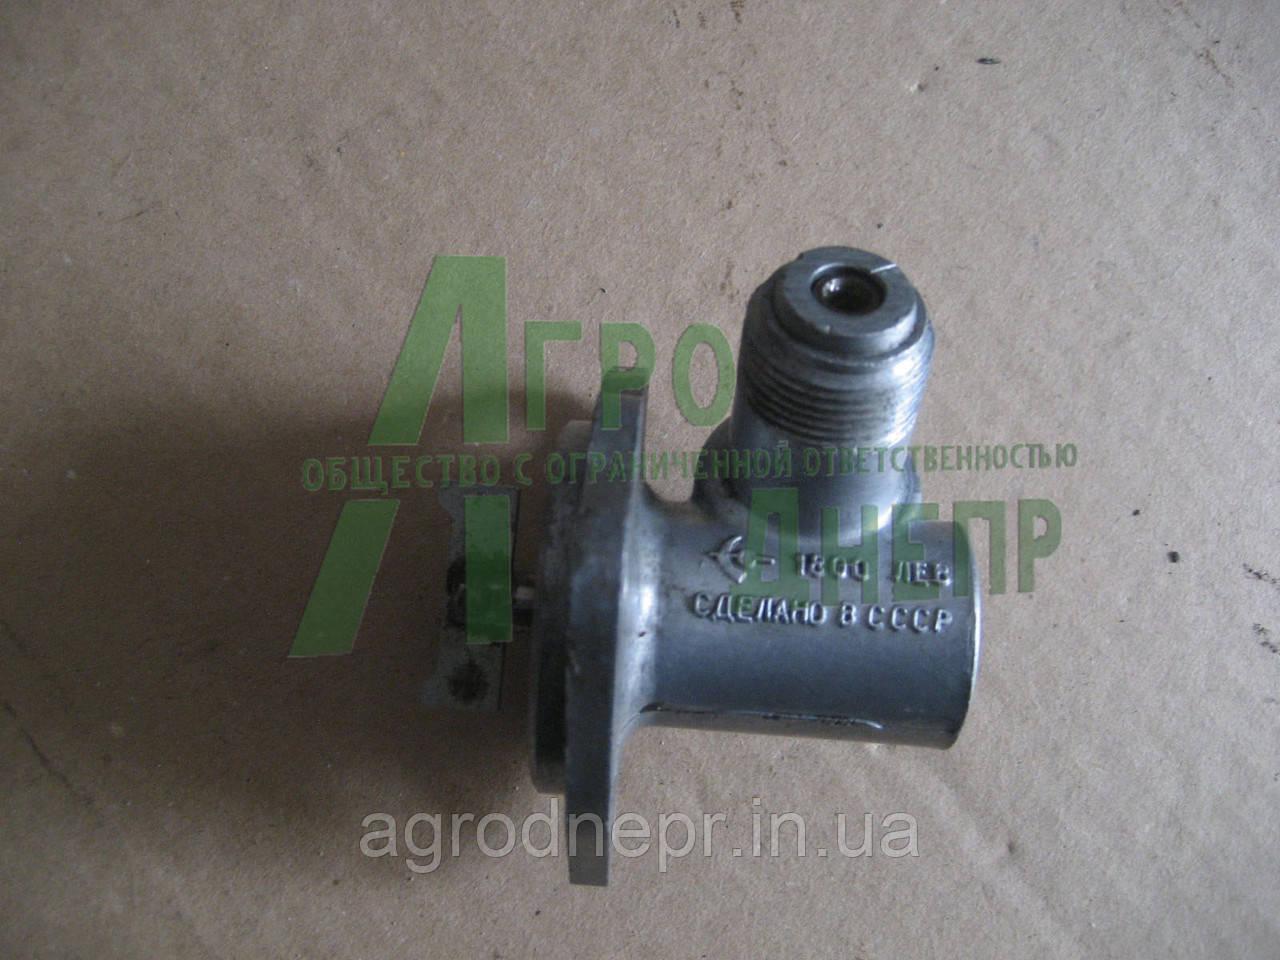 Привод тахоспидометра ЮМЗ ПТ-3802010-А 1800 оборотов